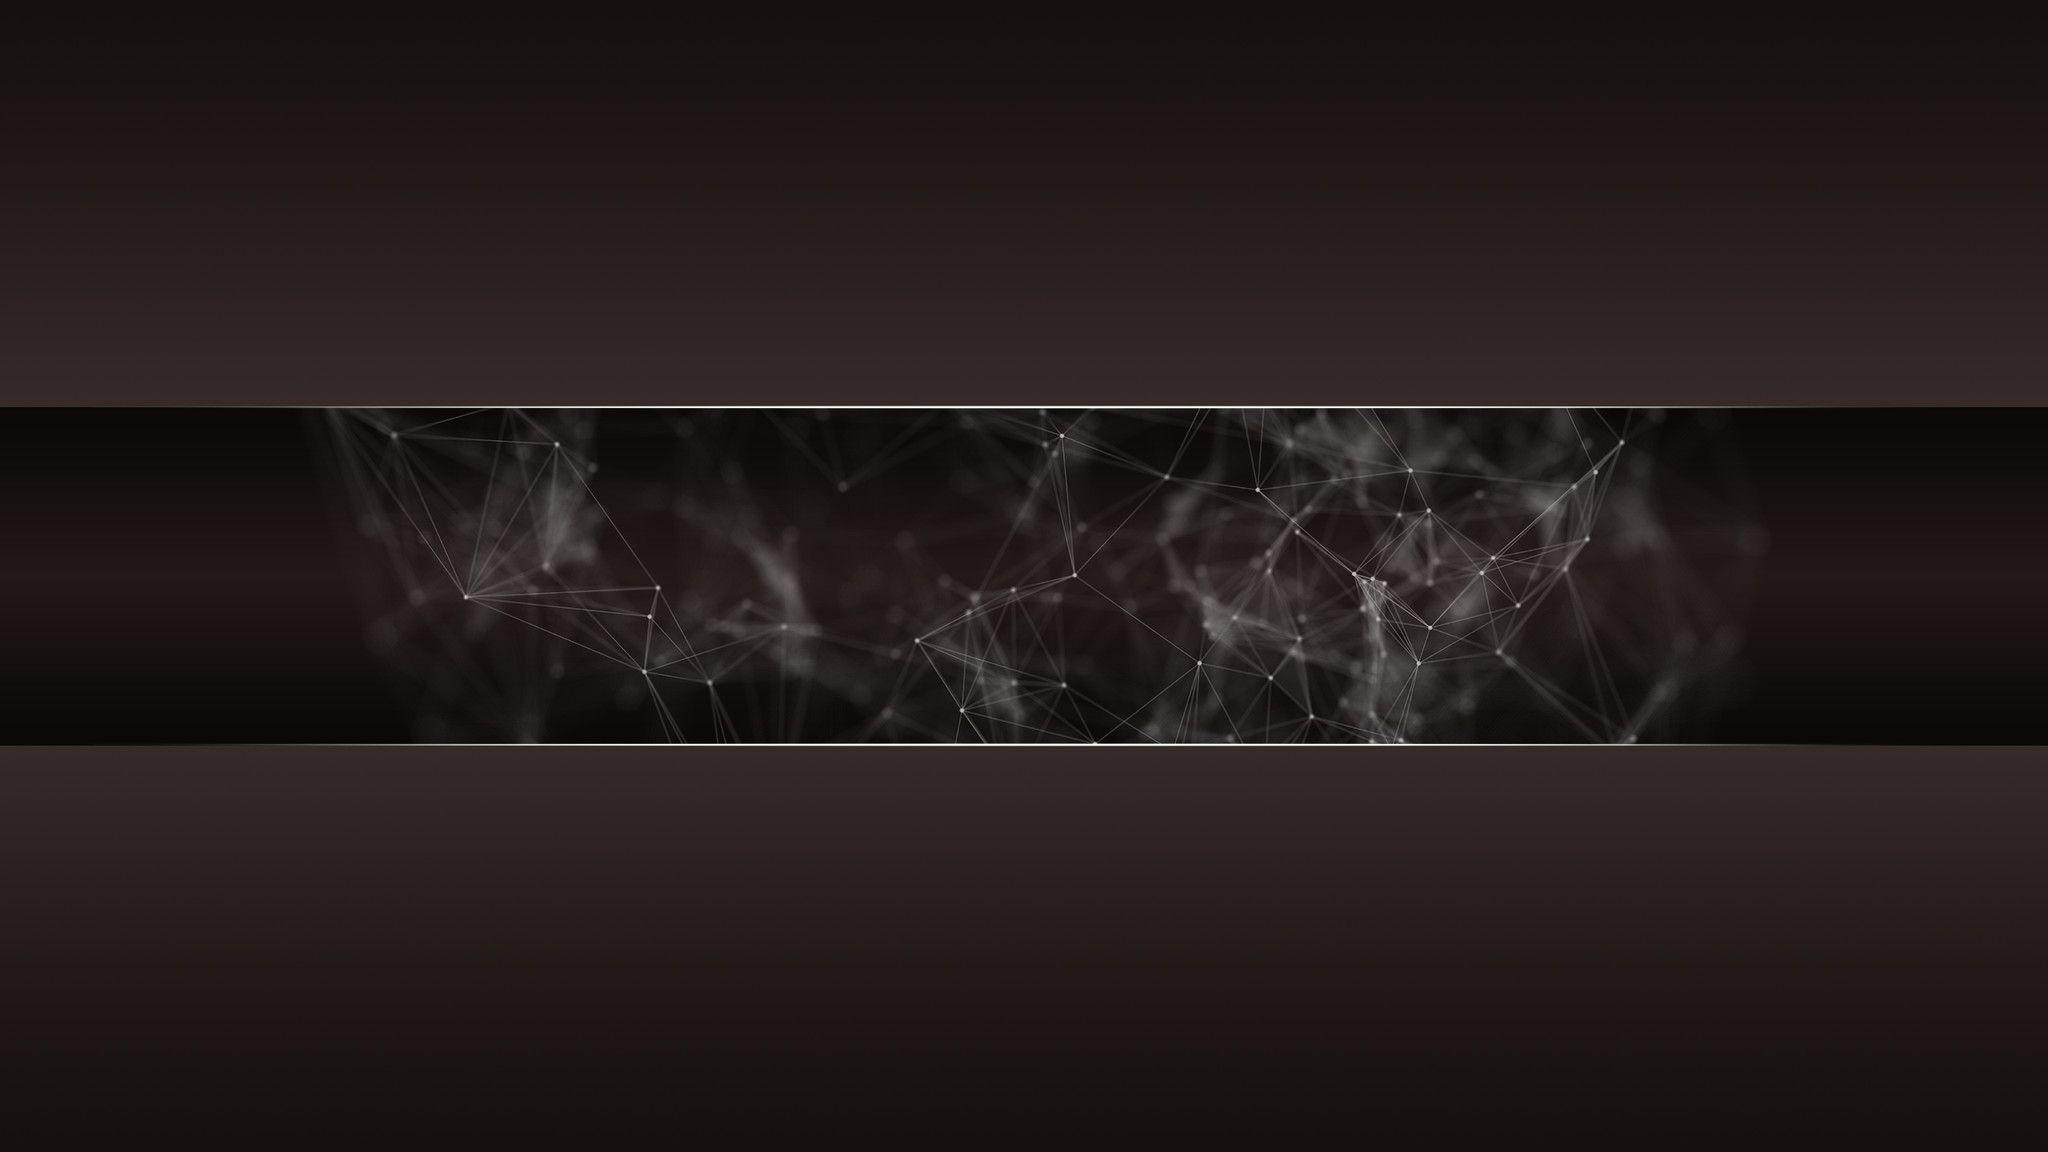 77 2048x1152 Youtube Wallpapers On Wallpaperplay Aplicativos